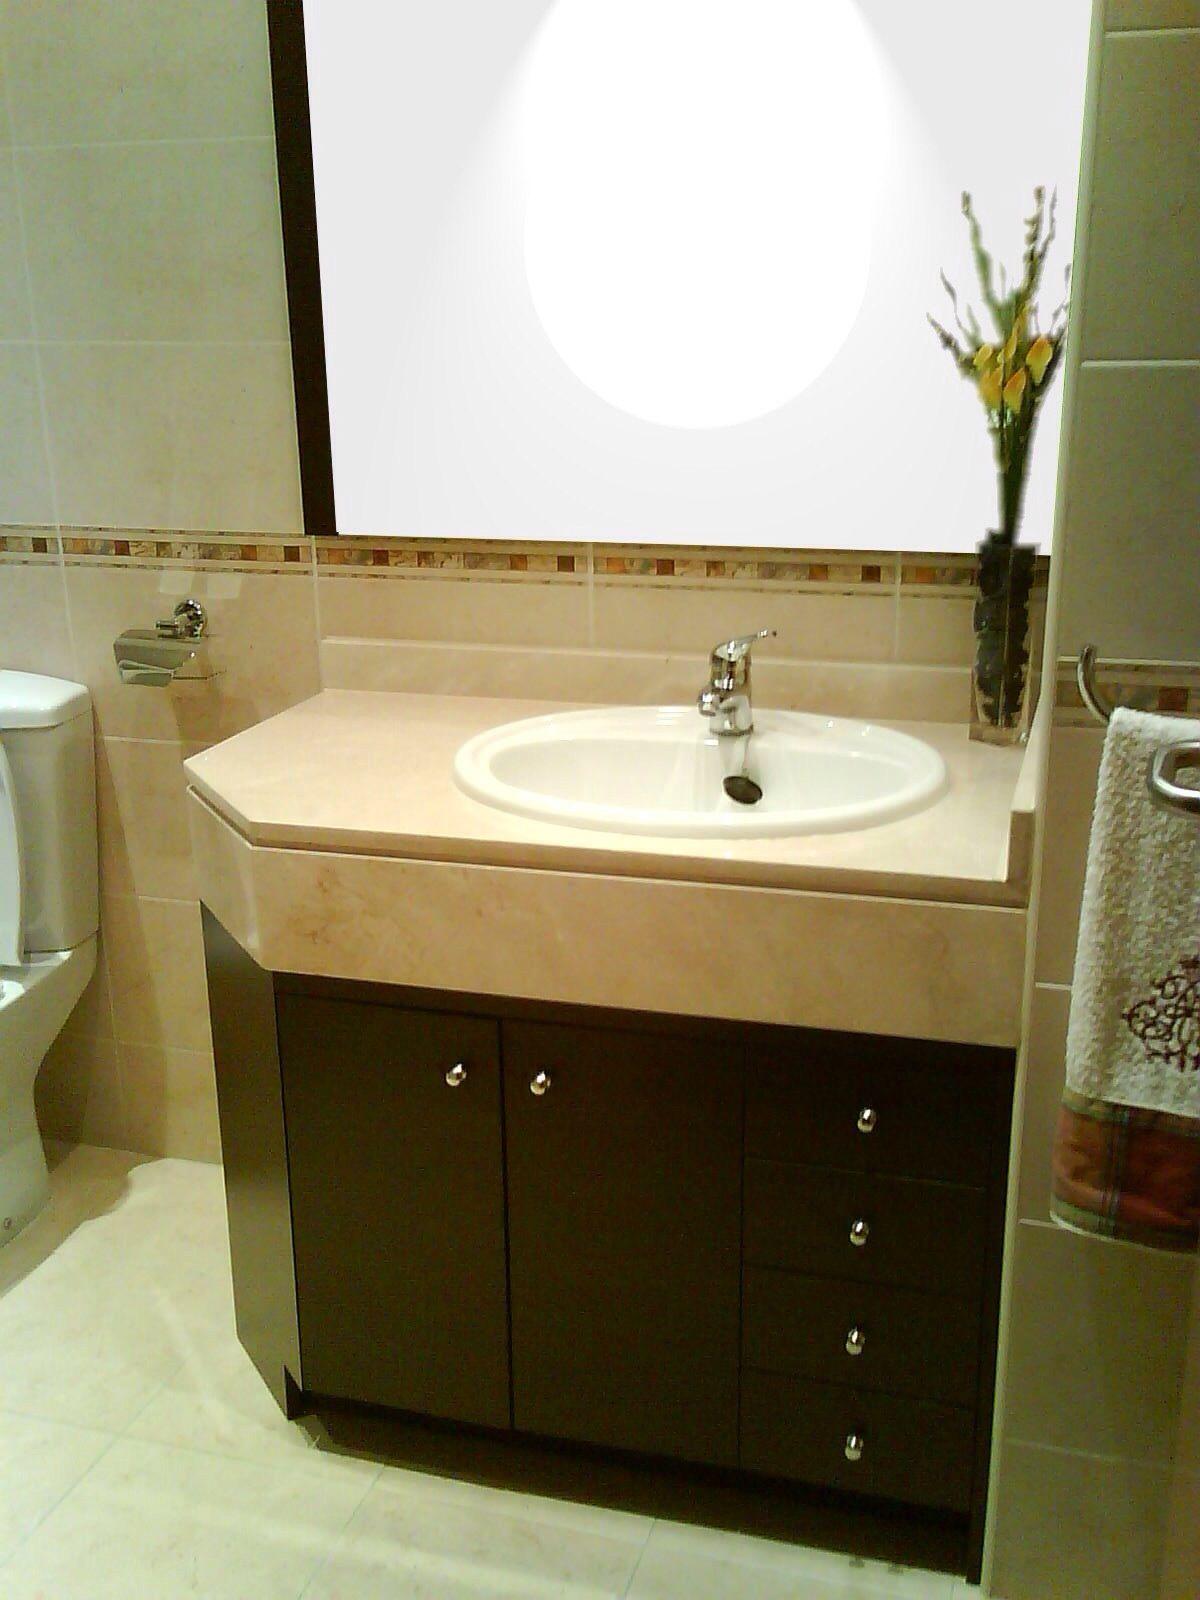 Mueble de baño a medida bajoencimera home pinterest